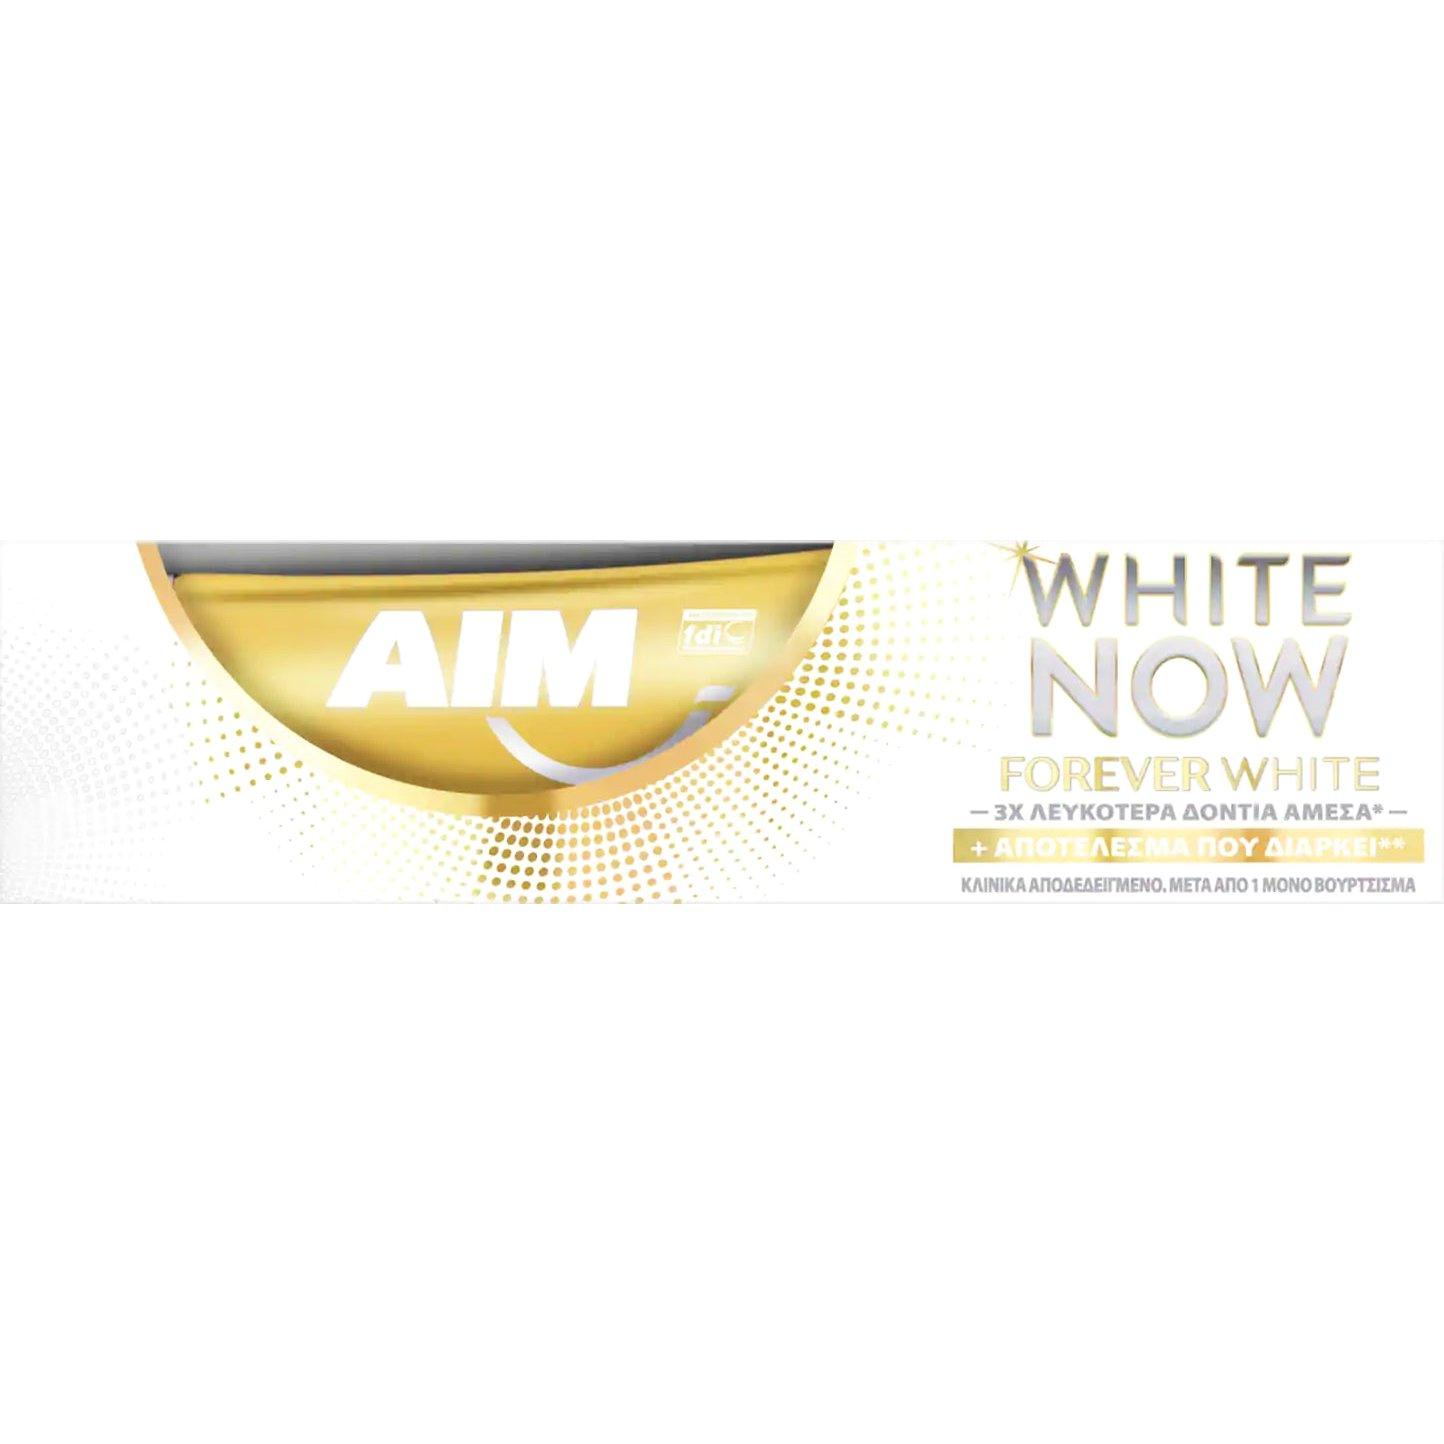 Aim White Now Forever White για Αστραφτερό Λευκό Χαμόγελο 75ml